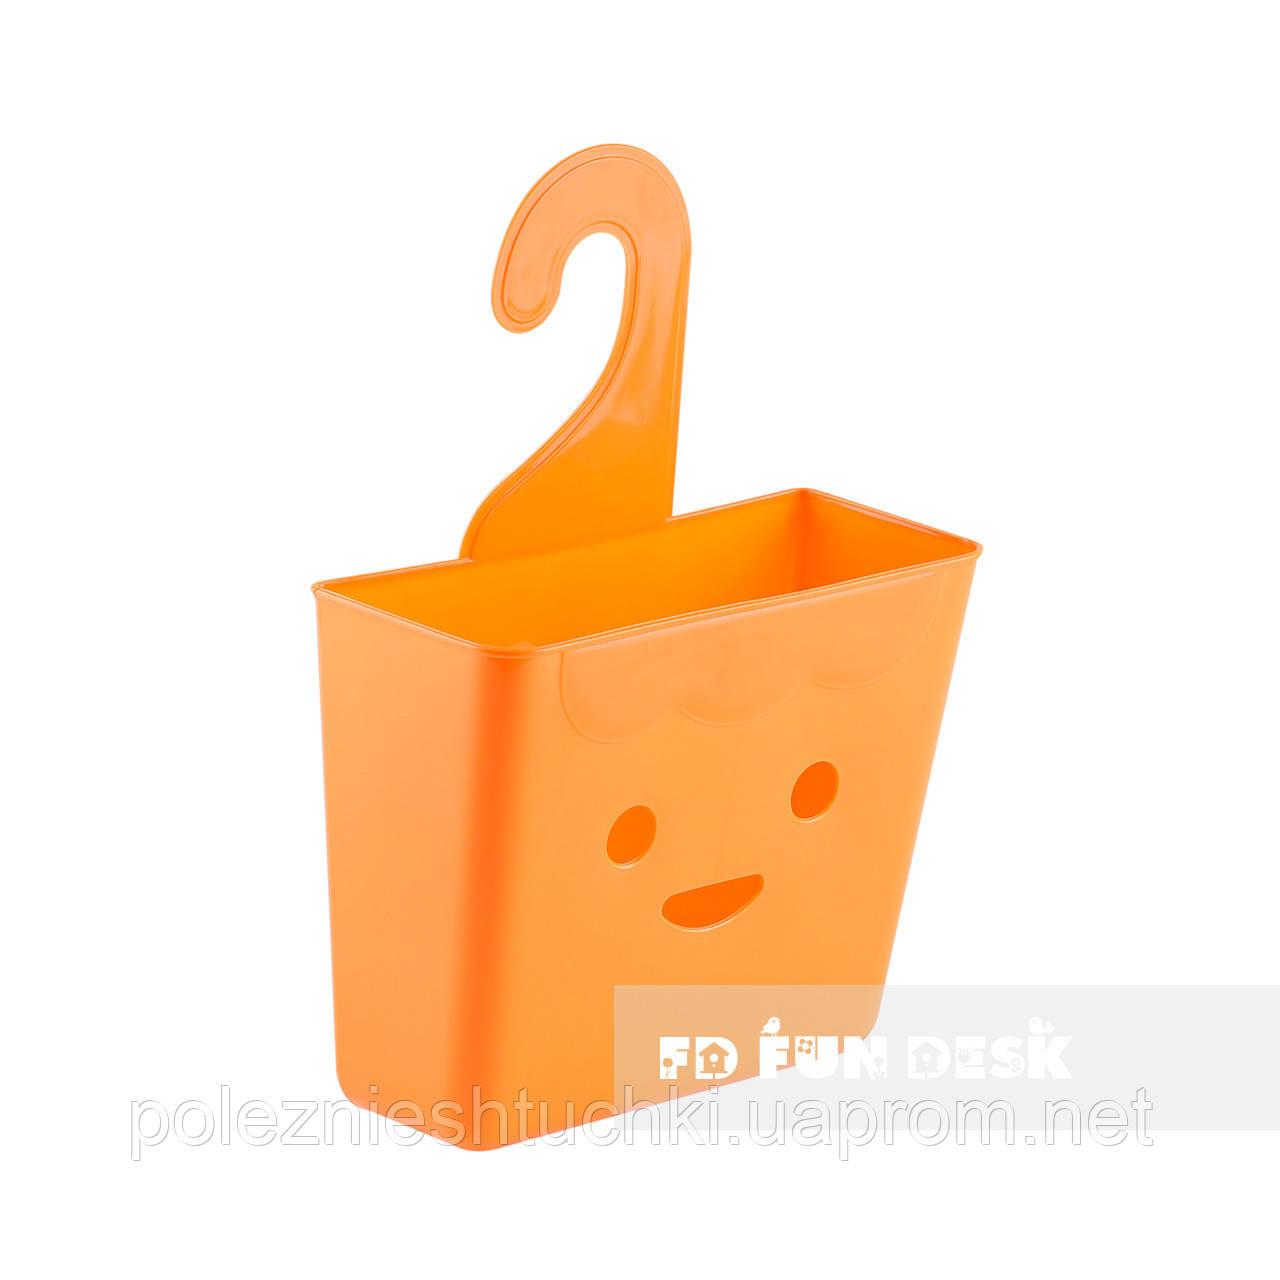 Корзинка для хранения MA 2 Orange CUBBY